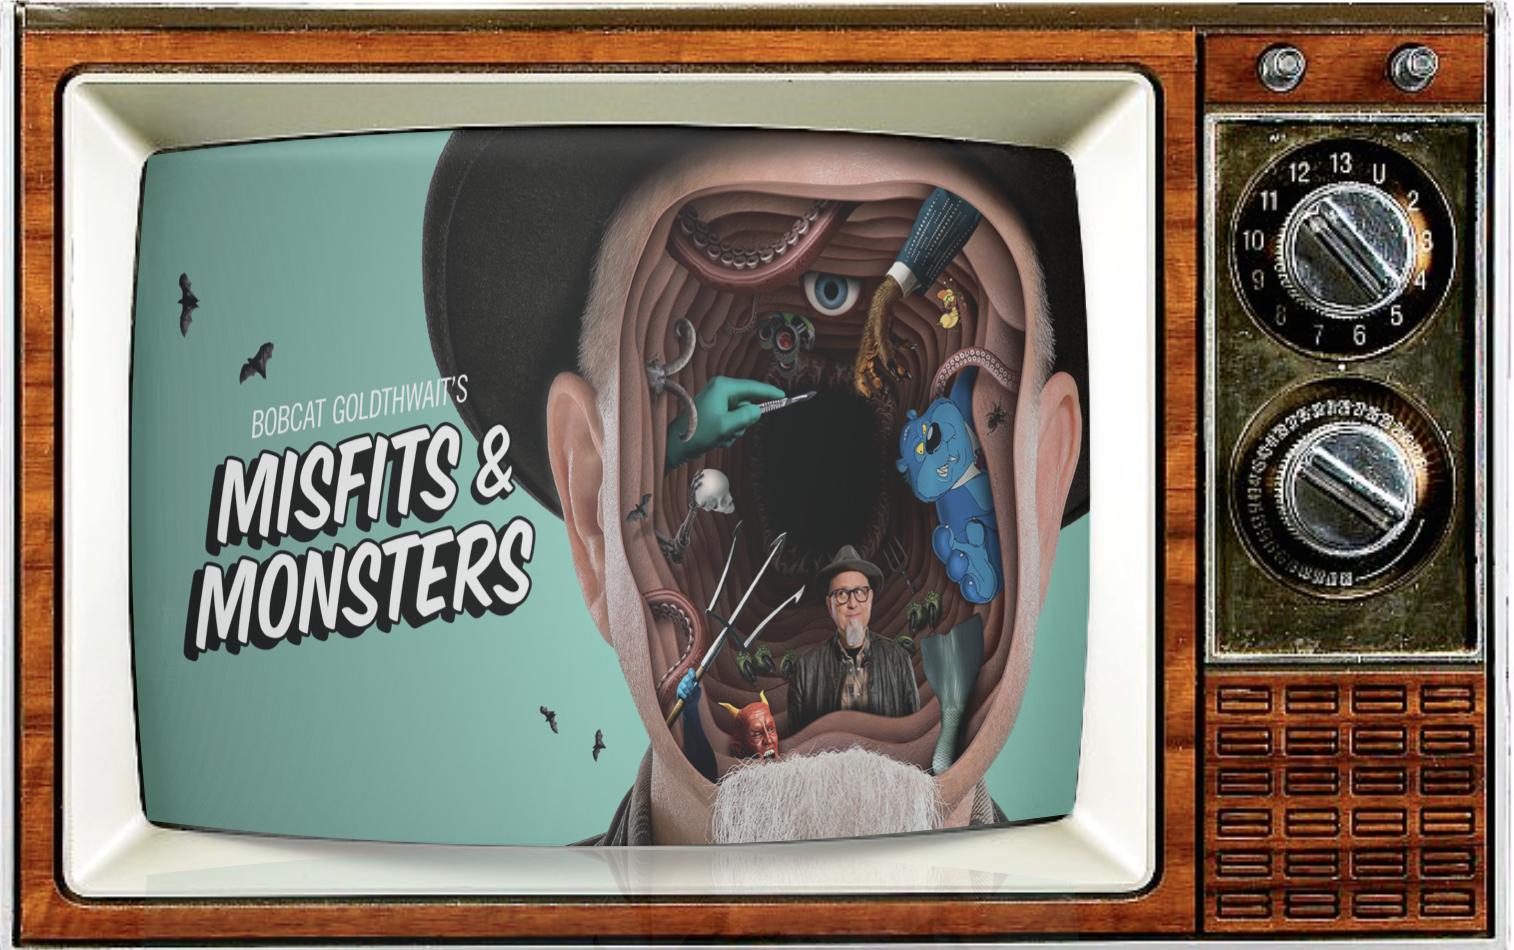 SMC Episode 72: It's Franken & Boo Berry Season 2018! w/ Bobcat Goldthwait 's Misfits & Monsters